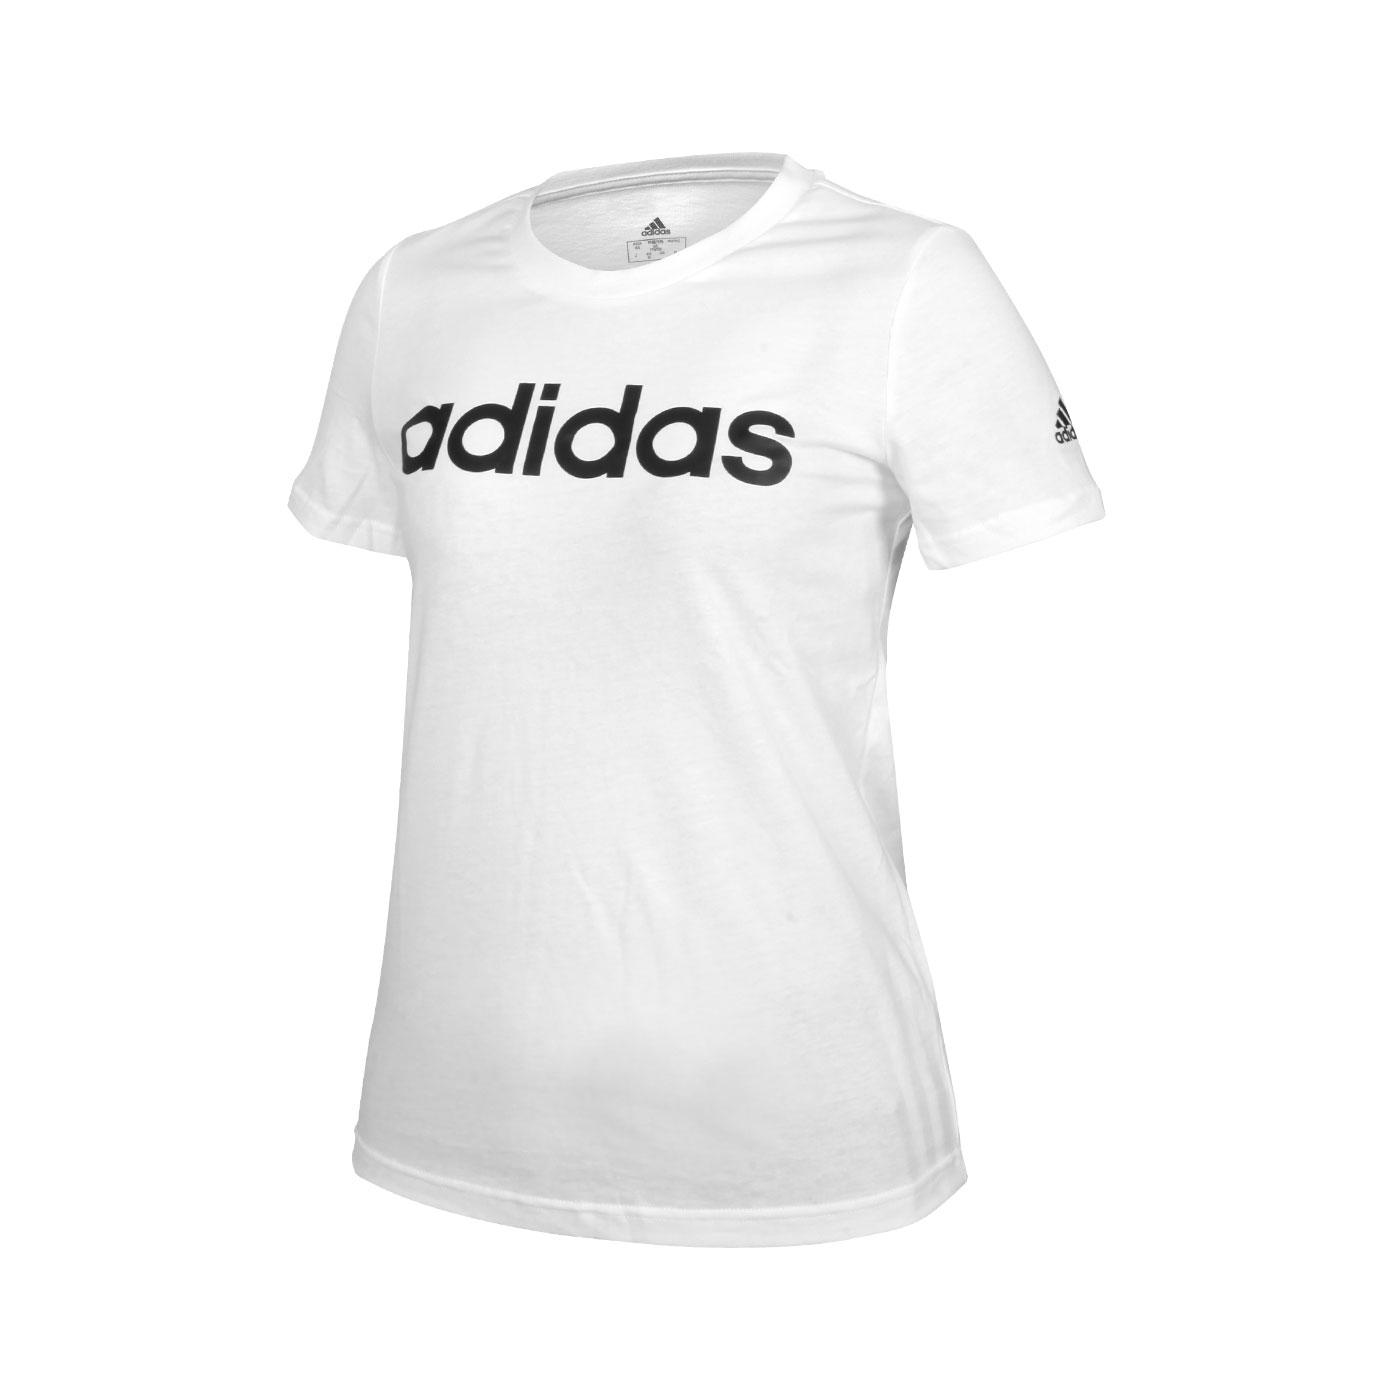 ADIDAS 女款短袖T恤 GL0768 - 白黑